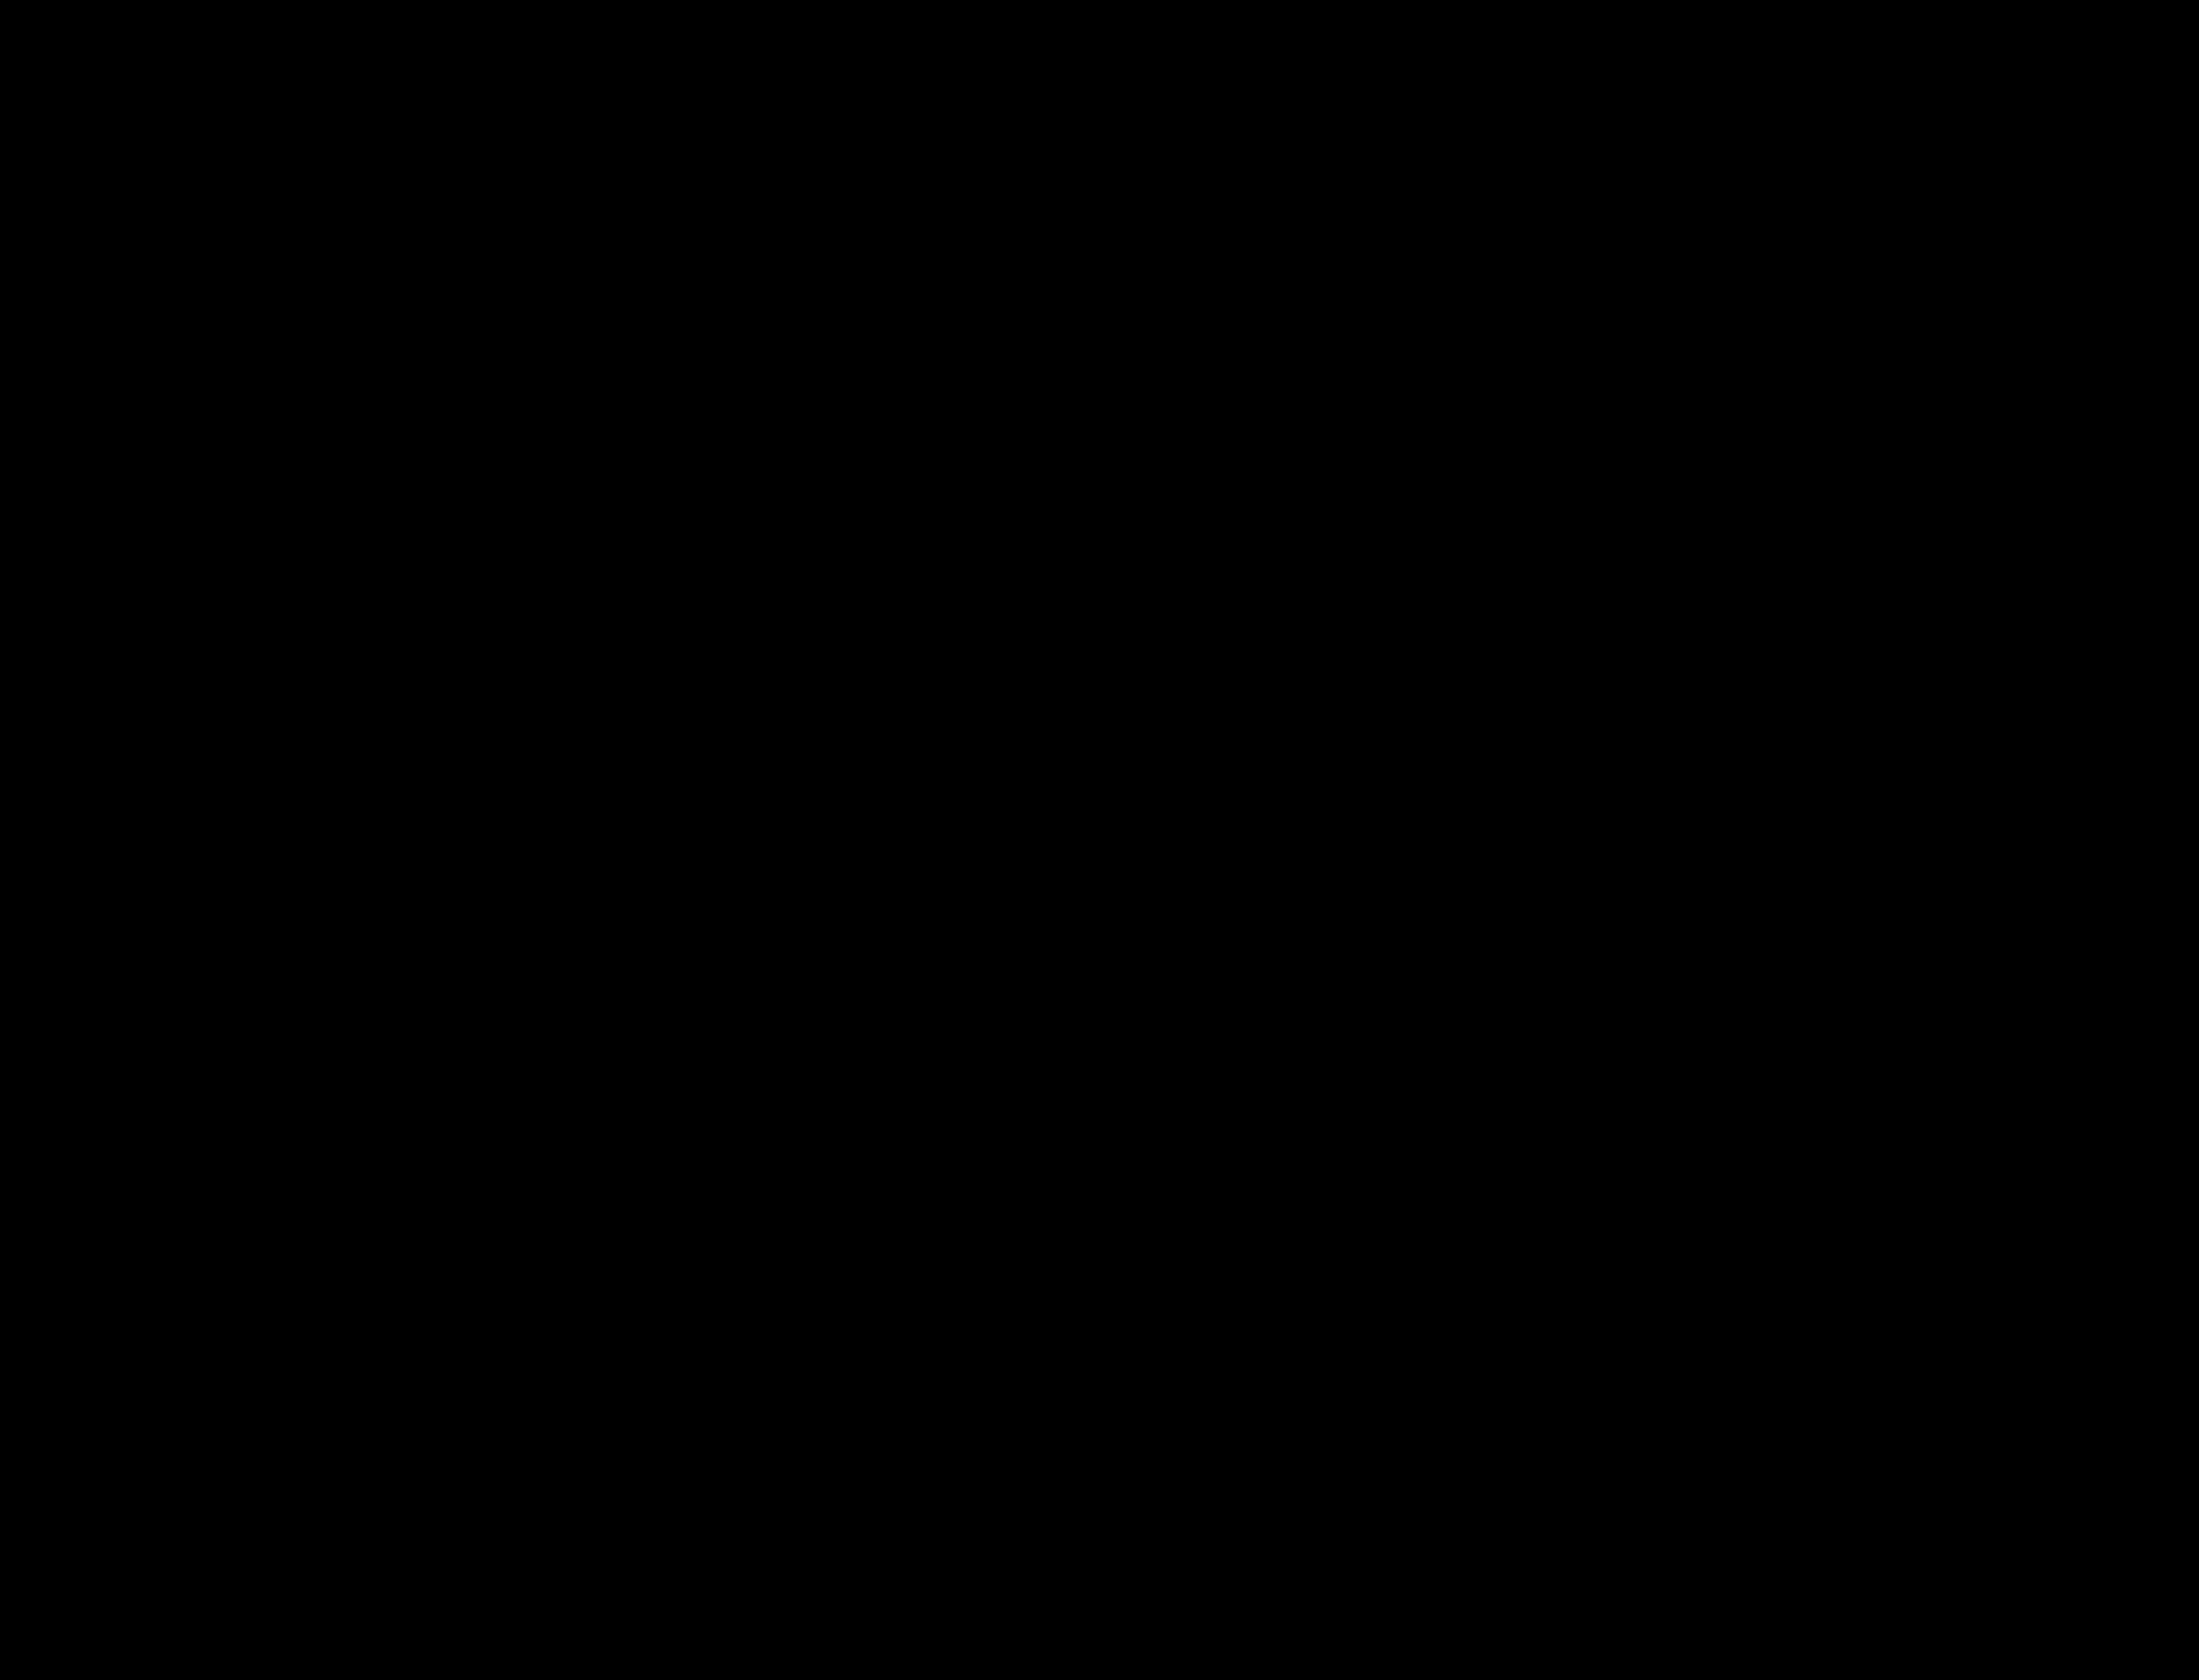 2298x1756 Clipart